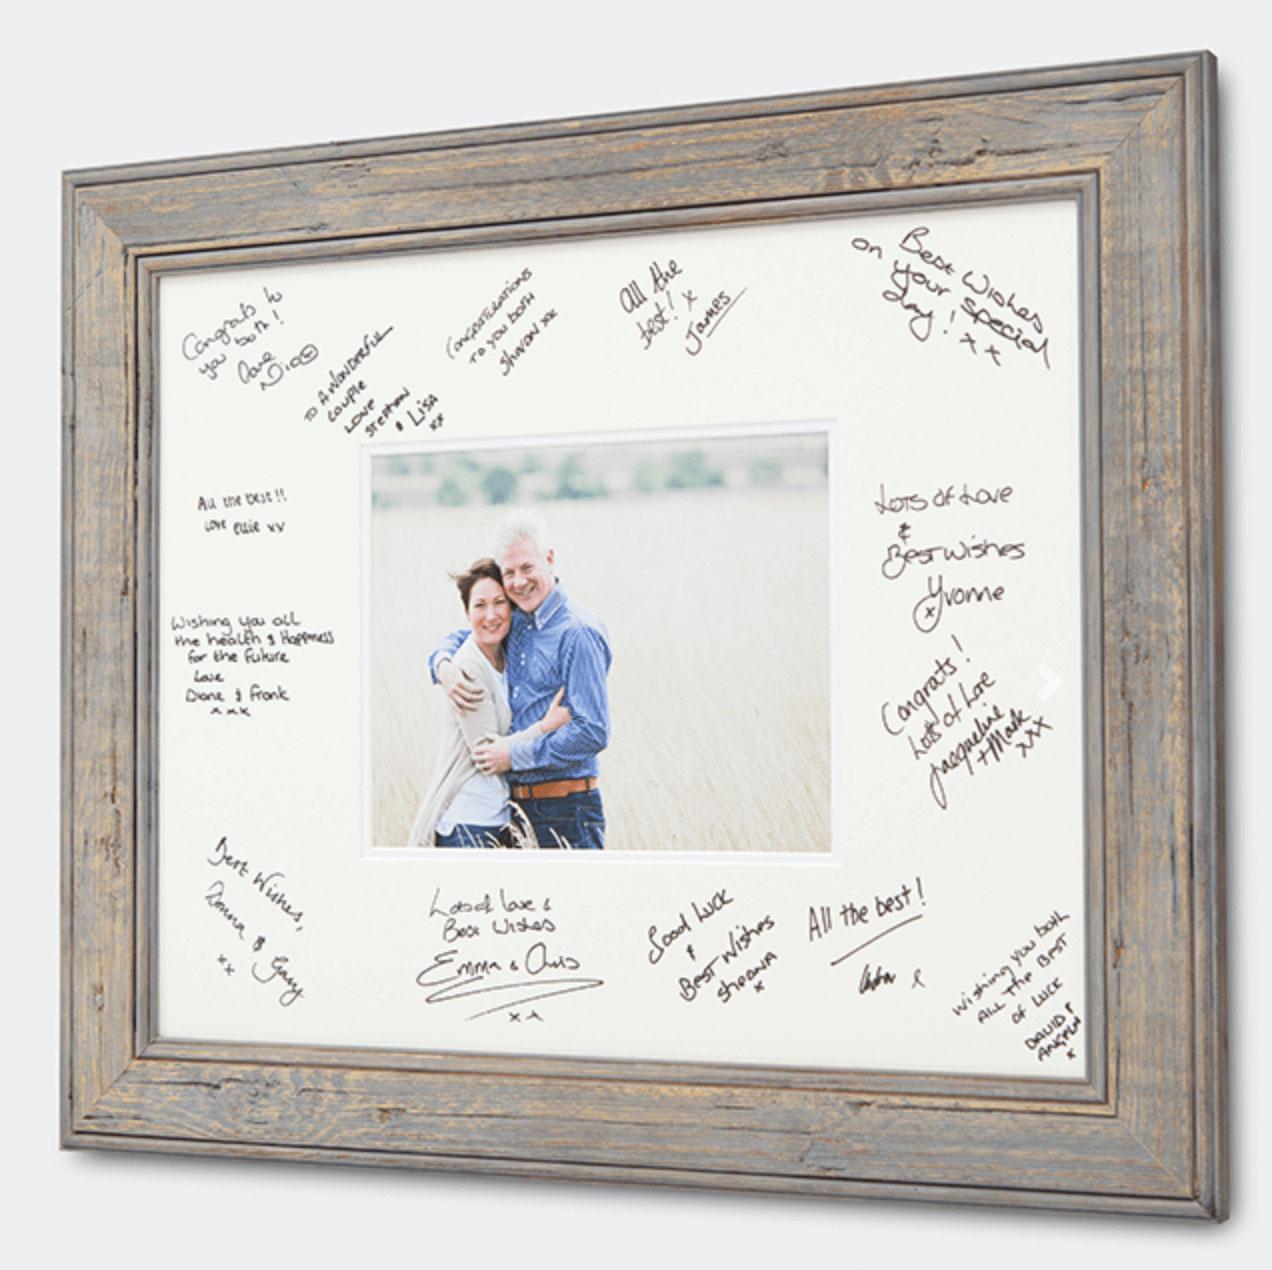 Hampshire Wedding Photograper Prices Frame